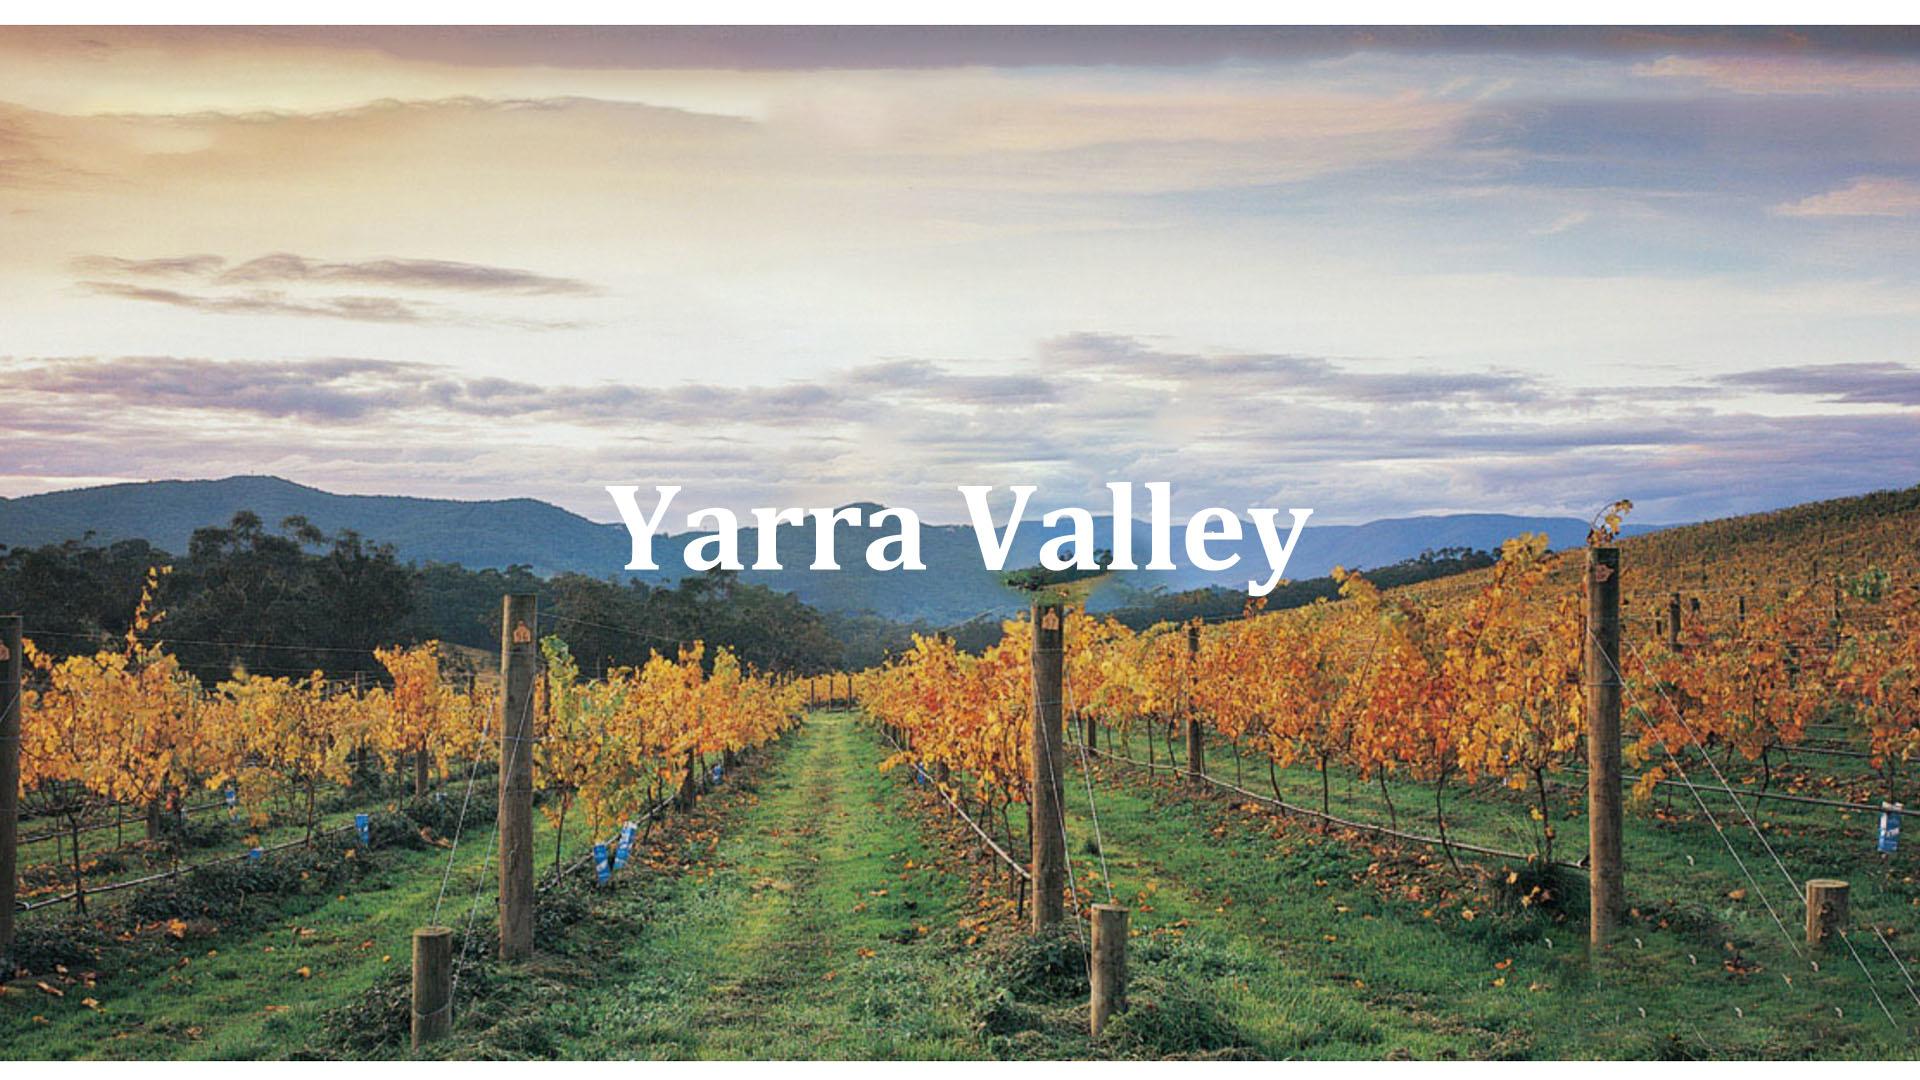 yarravalley,victoria,winery,australianwine,redwine,whitewine,hongkong,watsonswine,香港,澳洲紅酒,紅酒批發,澳洲酒批發,rngwine,澳洲白酒